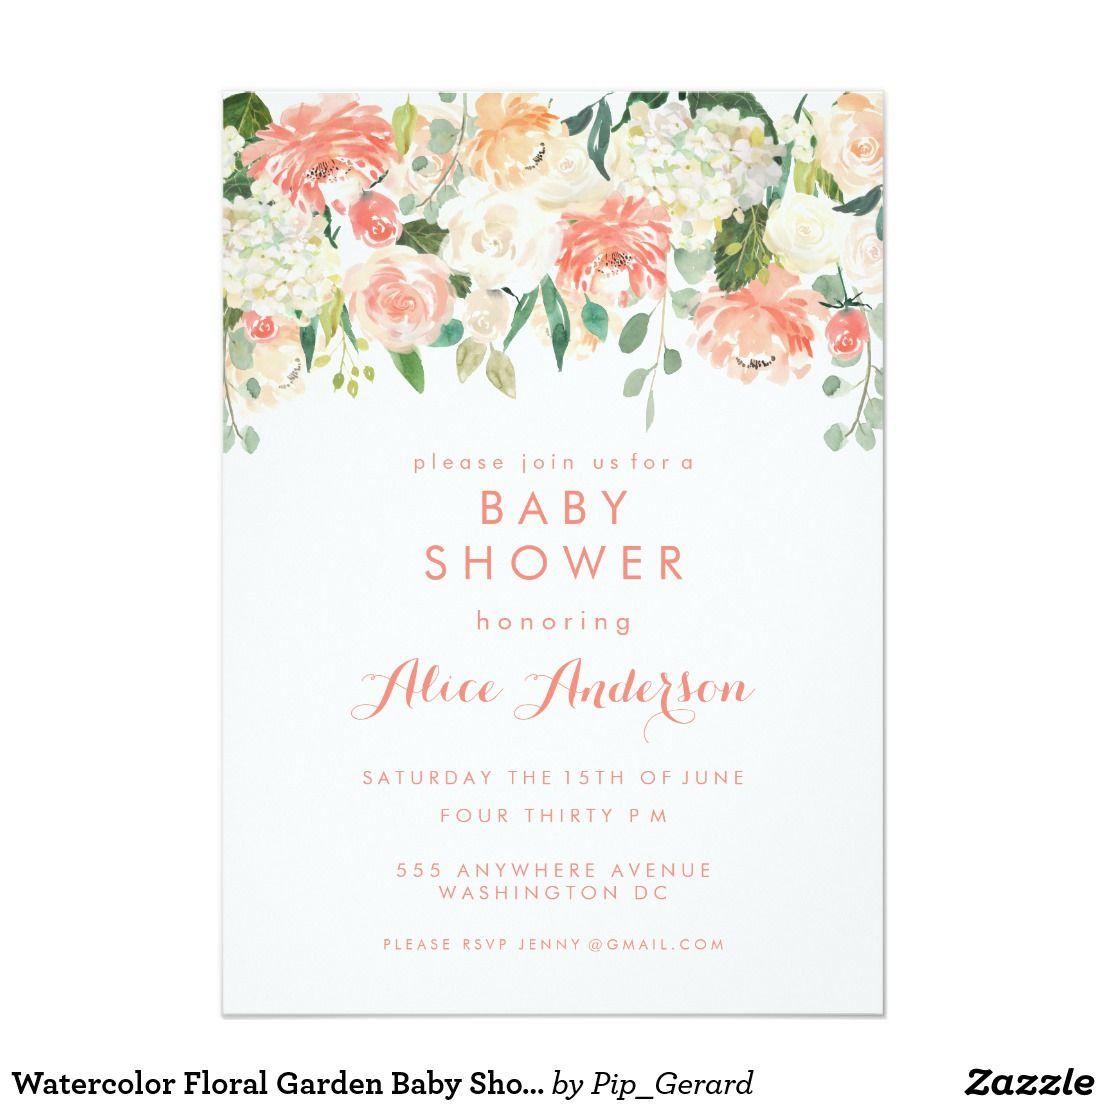 Watercolor Floral Garden Baby Shower Invite | Garden baby showers ...